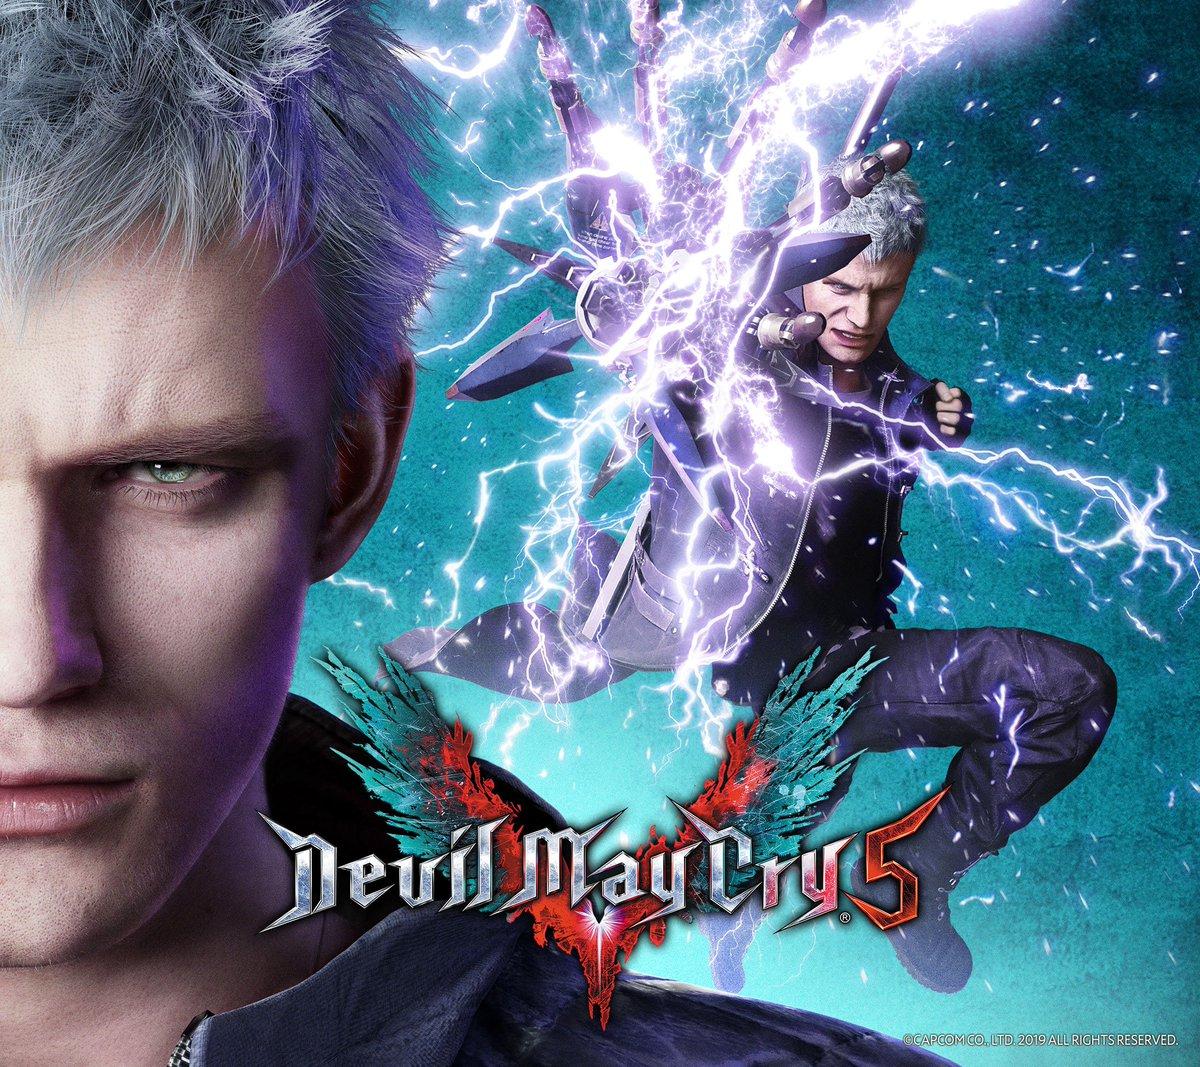 Nero-DMC5-Wallpaper-devil-may-cry-42744390-1200-1067.jpg